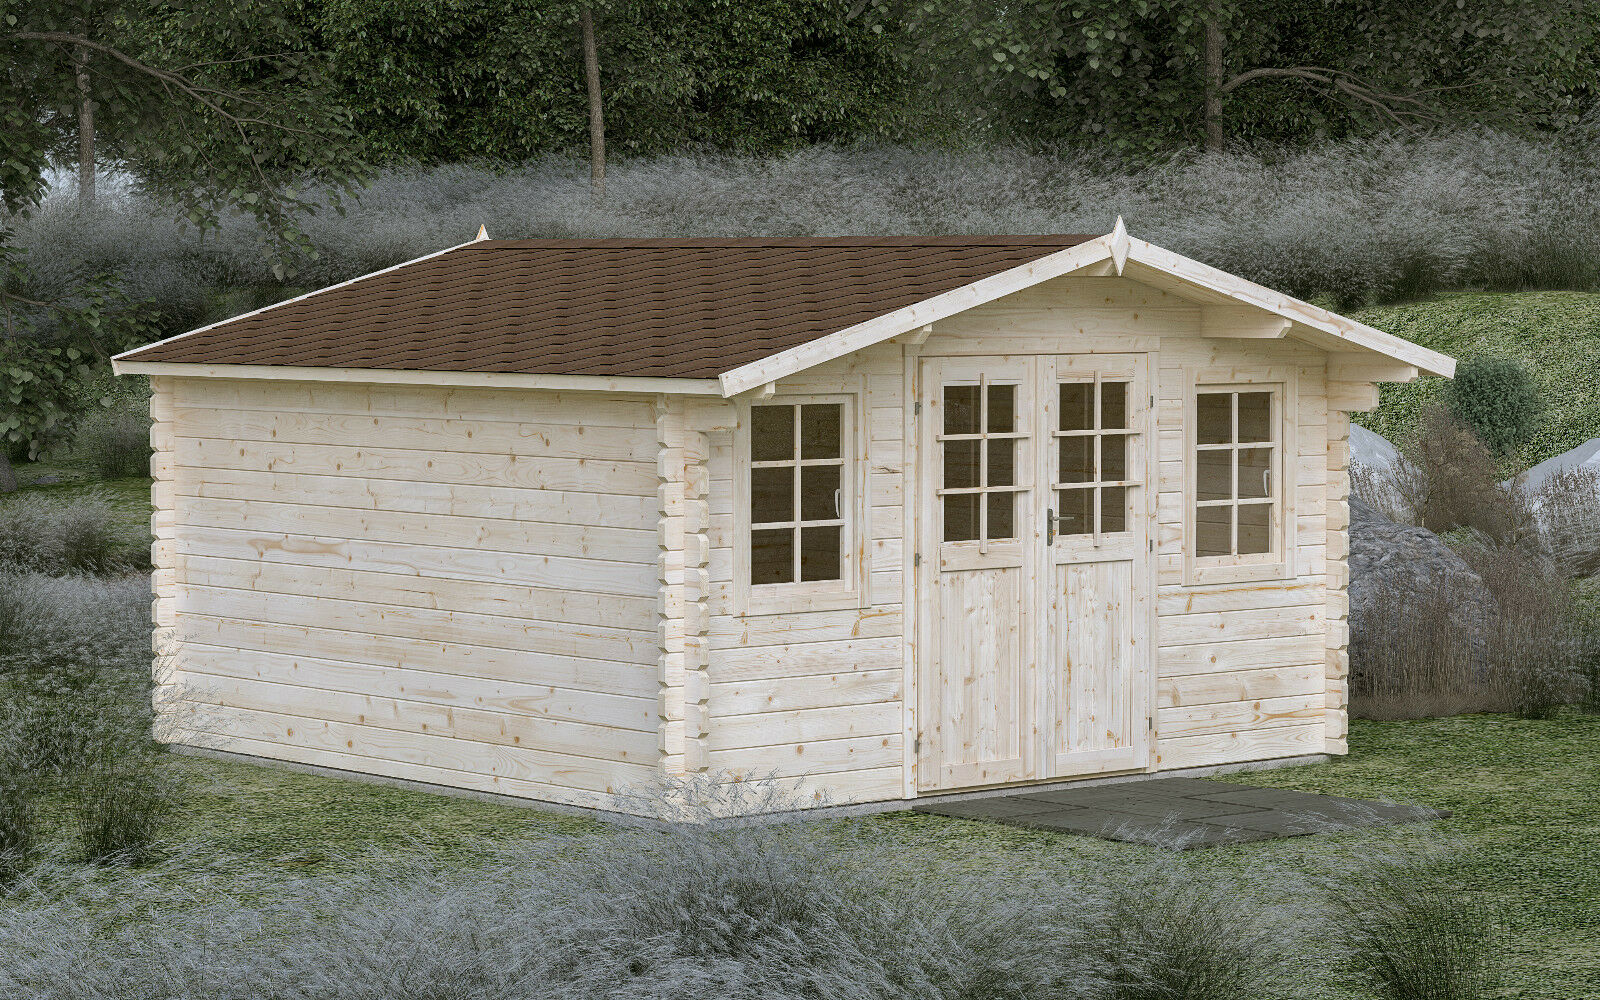 44 mm gartenhaus gera inklusive montage ca 4x4 m aufbau gerätehaus